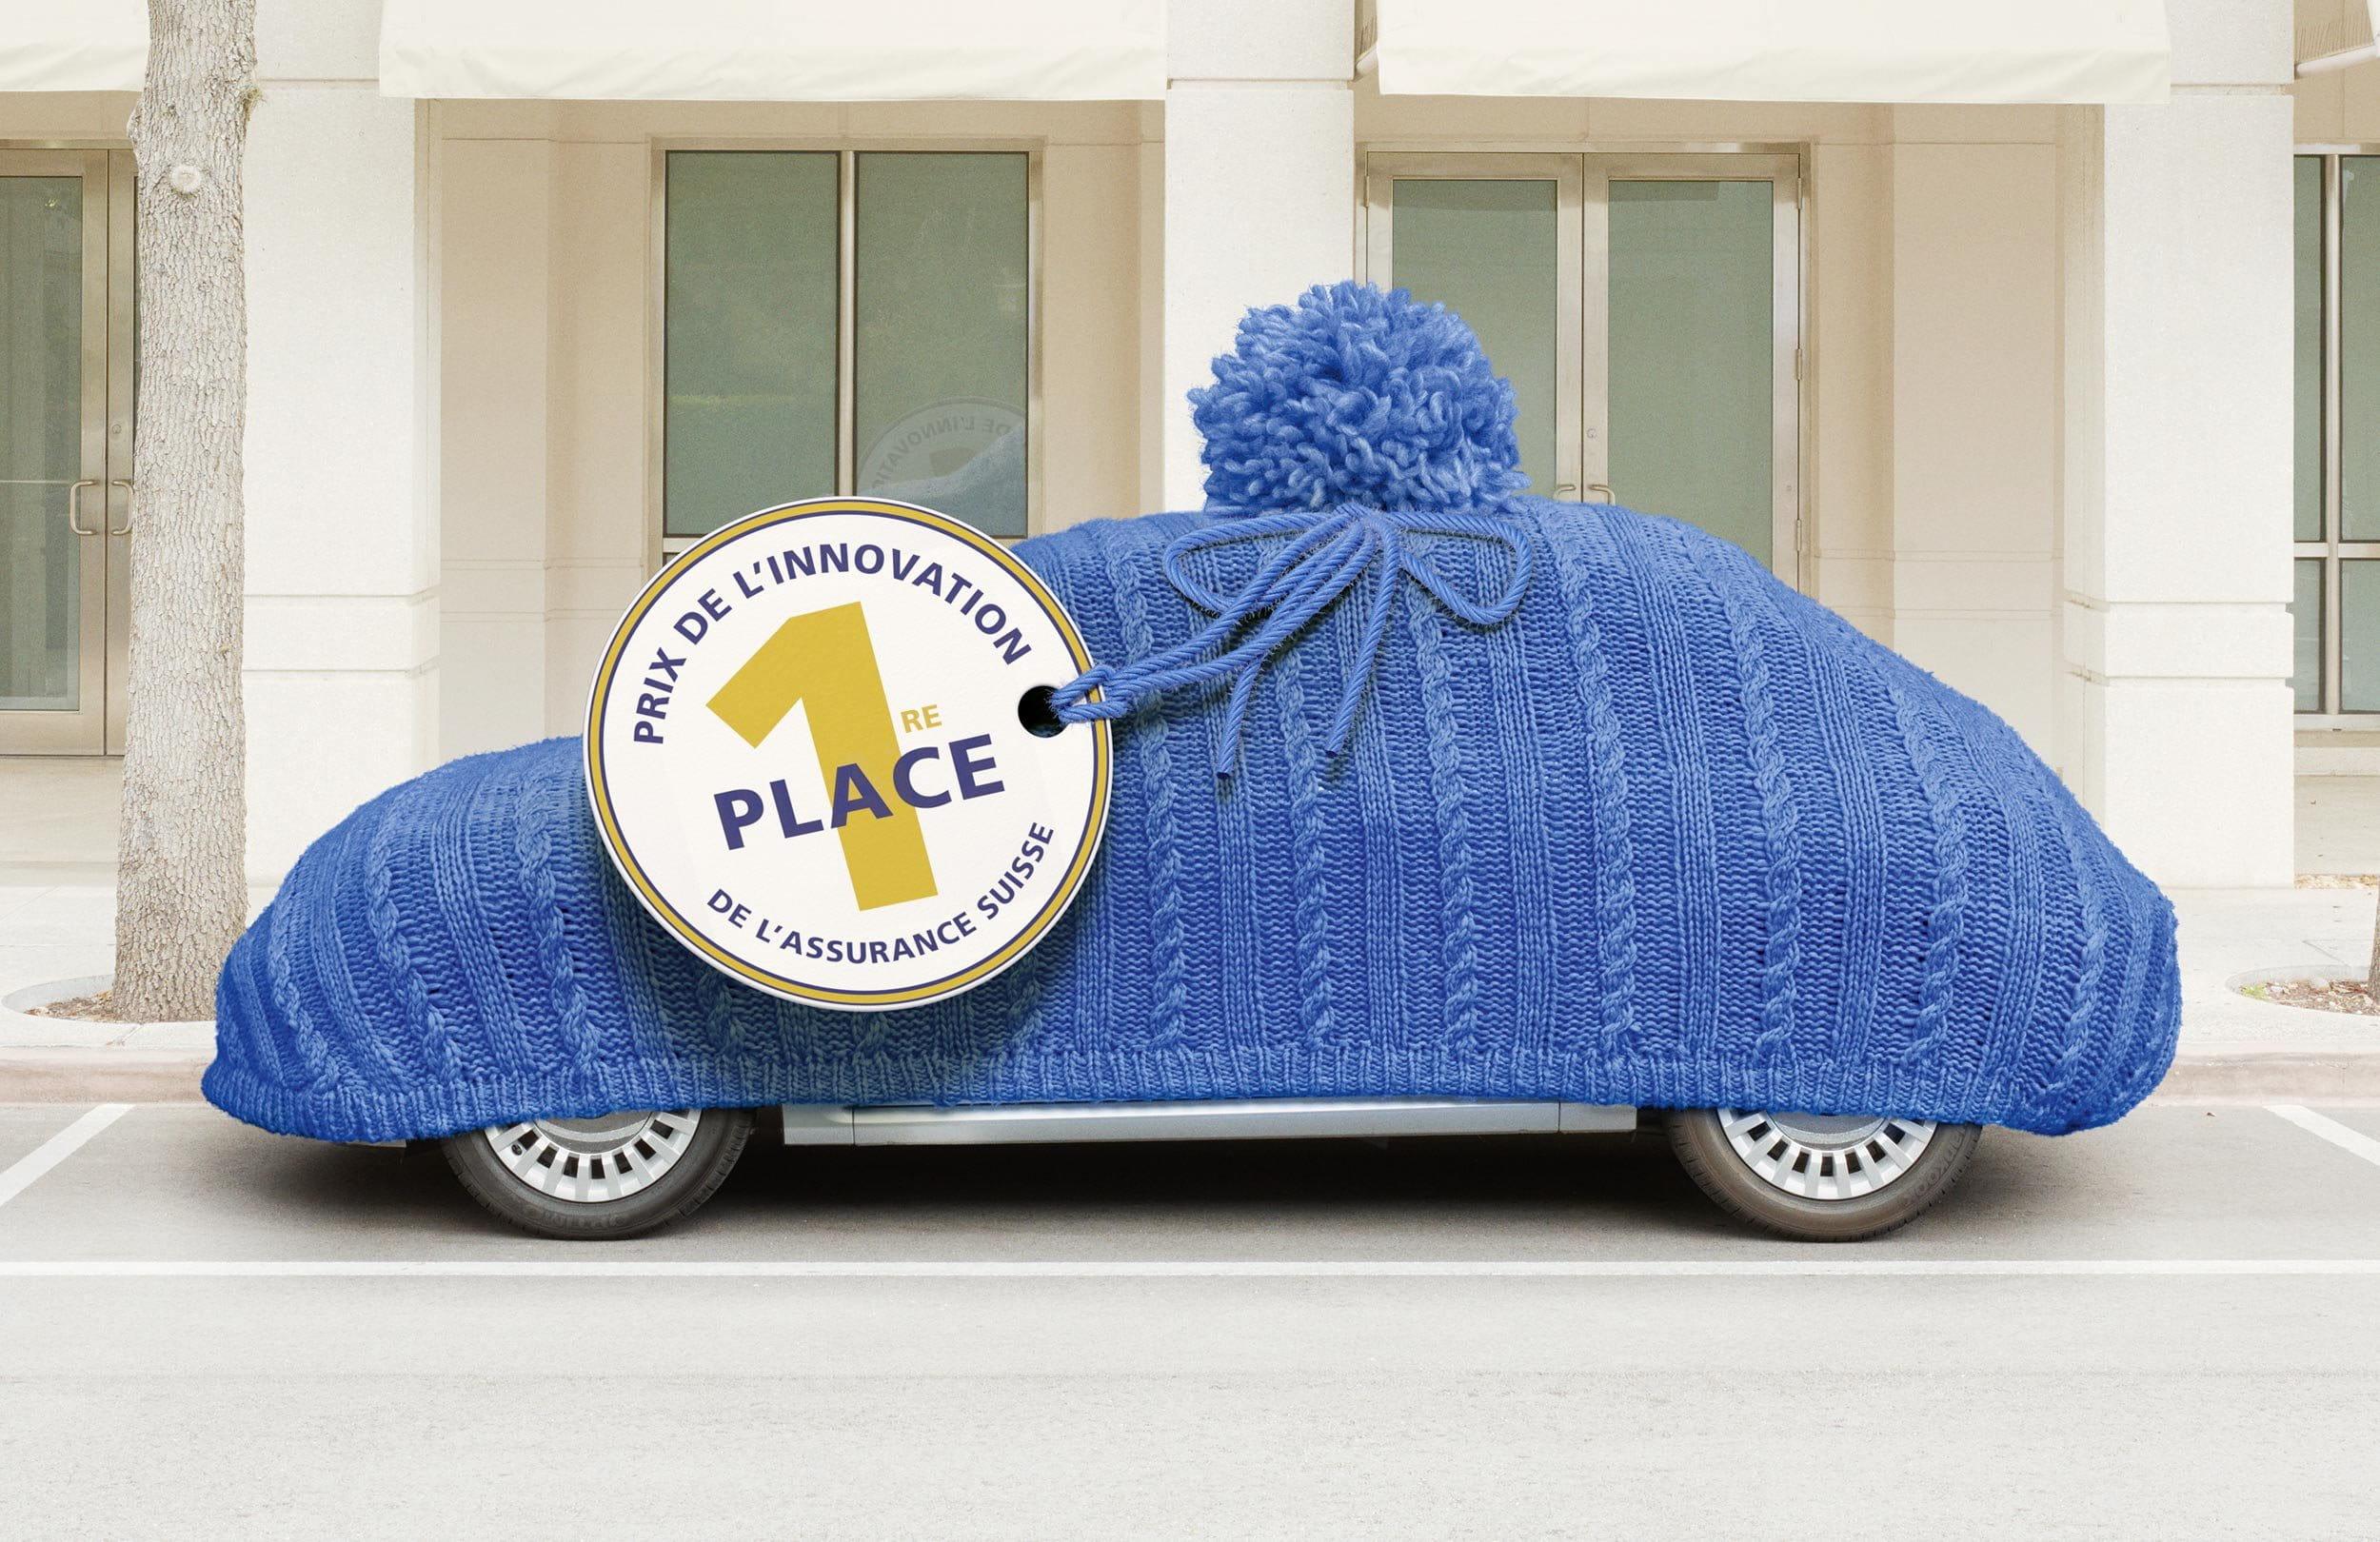 assurance automobile zurich suisse. Black Bedroom Furniture Sets. Home Design Ideas